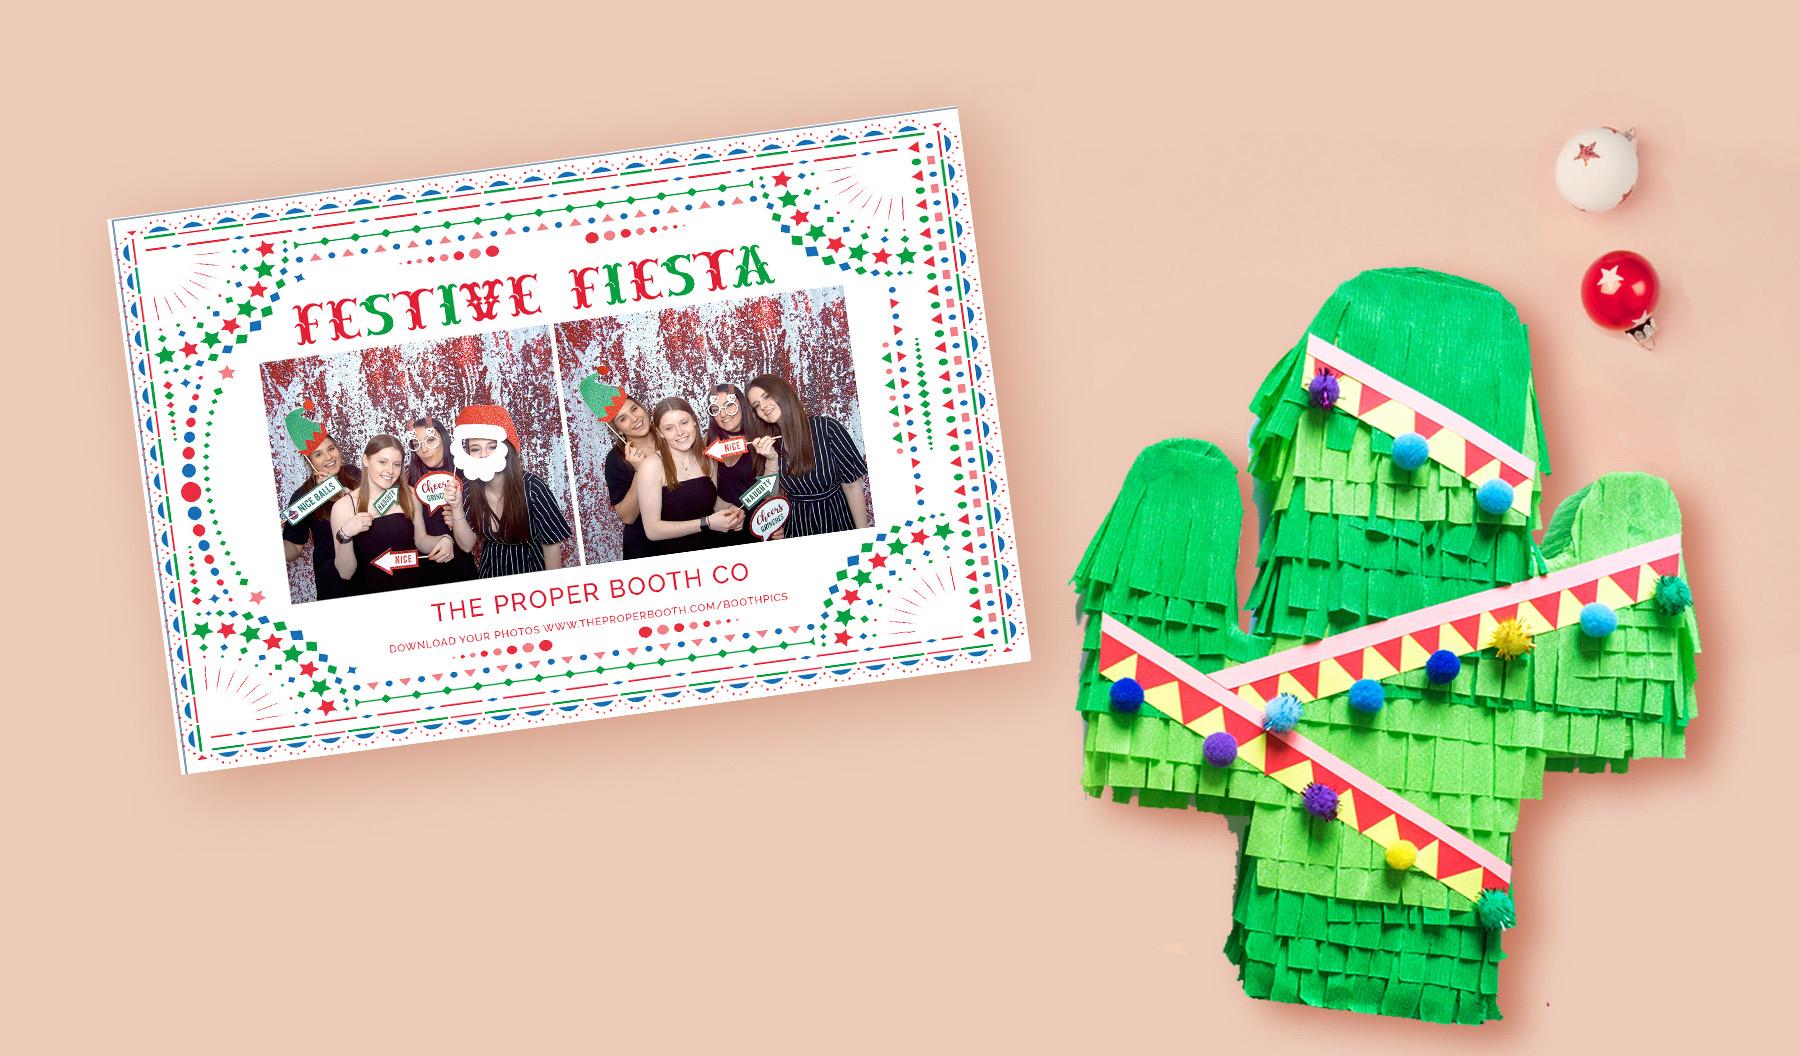 Festive Fiesta Christmas Photobooth